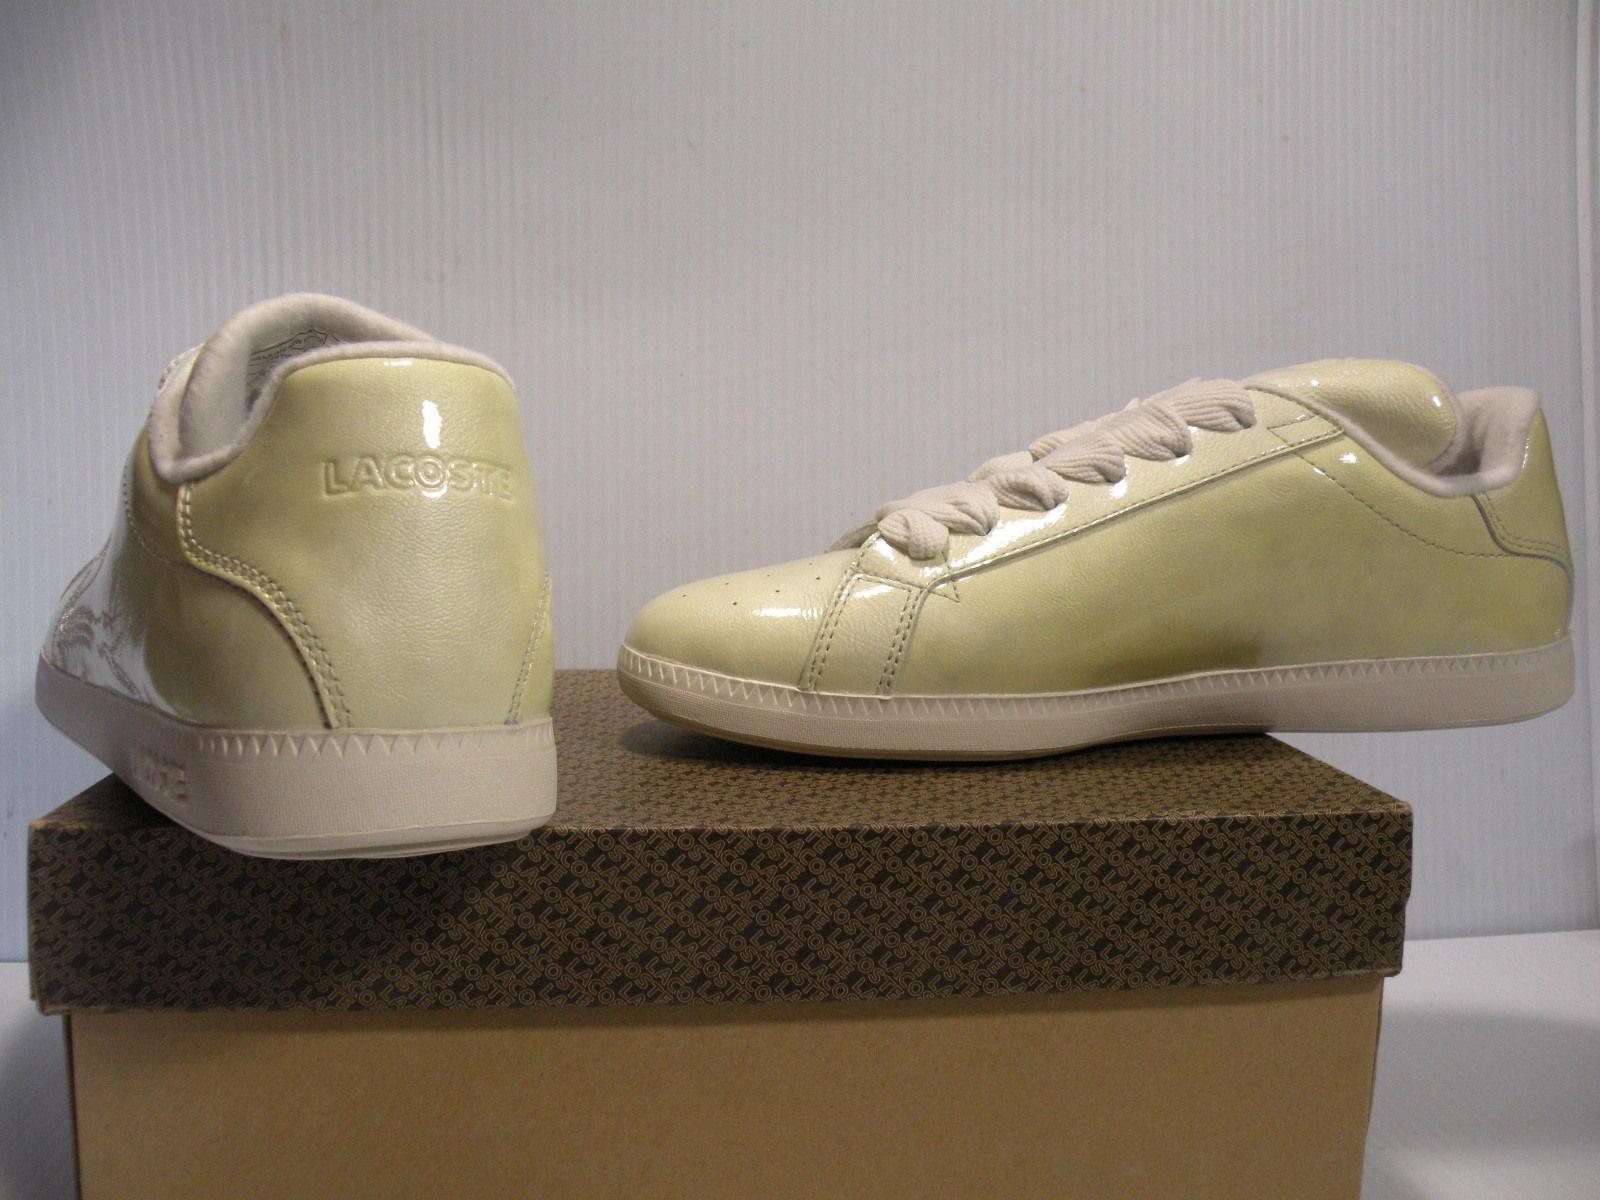 LACOSTE GRADUATE NEW FUNK SPORT femmes chaussures chaussures chaussures jaune 4STW7981-L42 Taille 9.5 NEW f6bec9